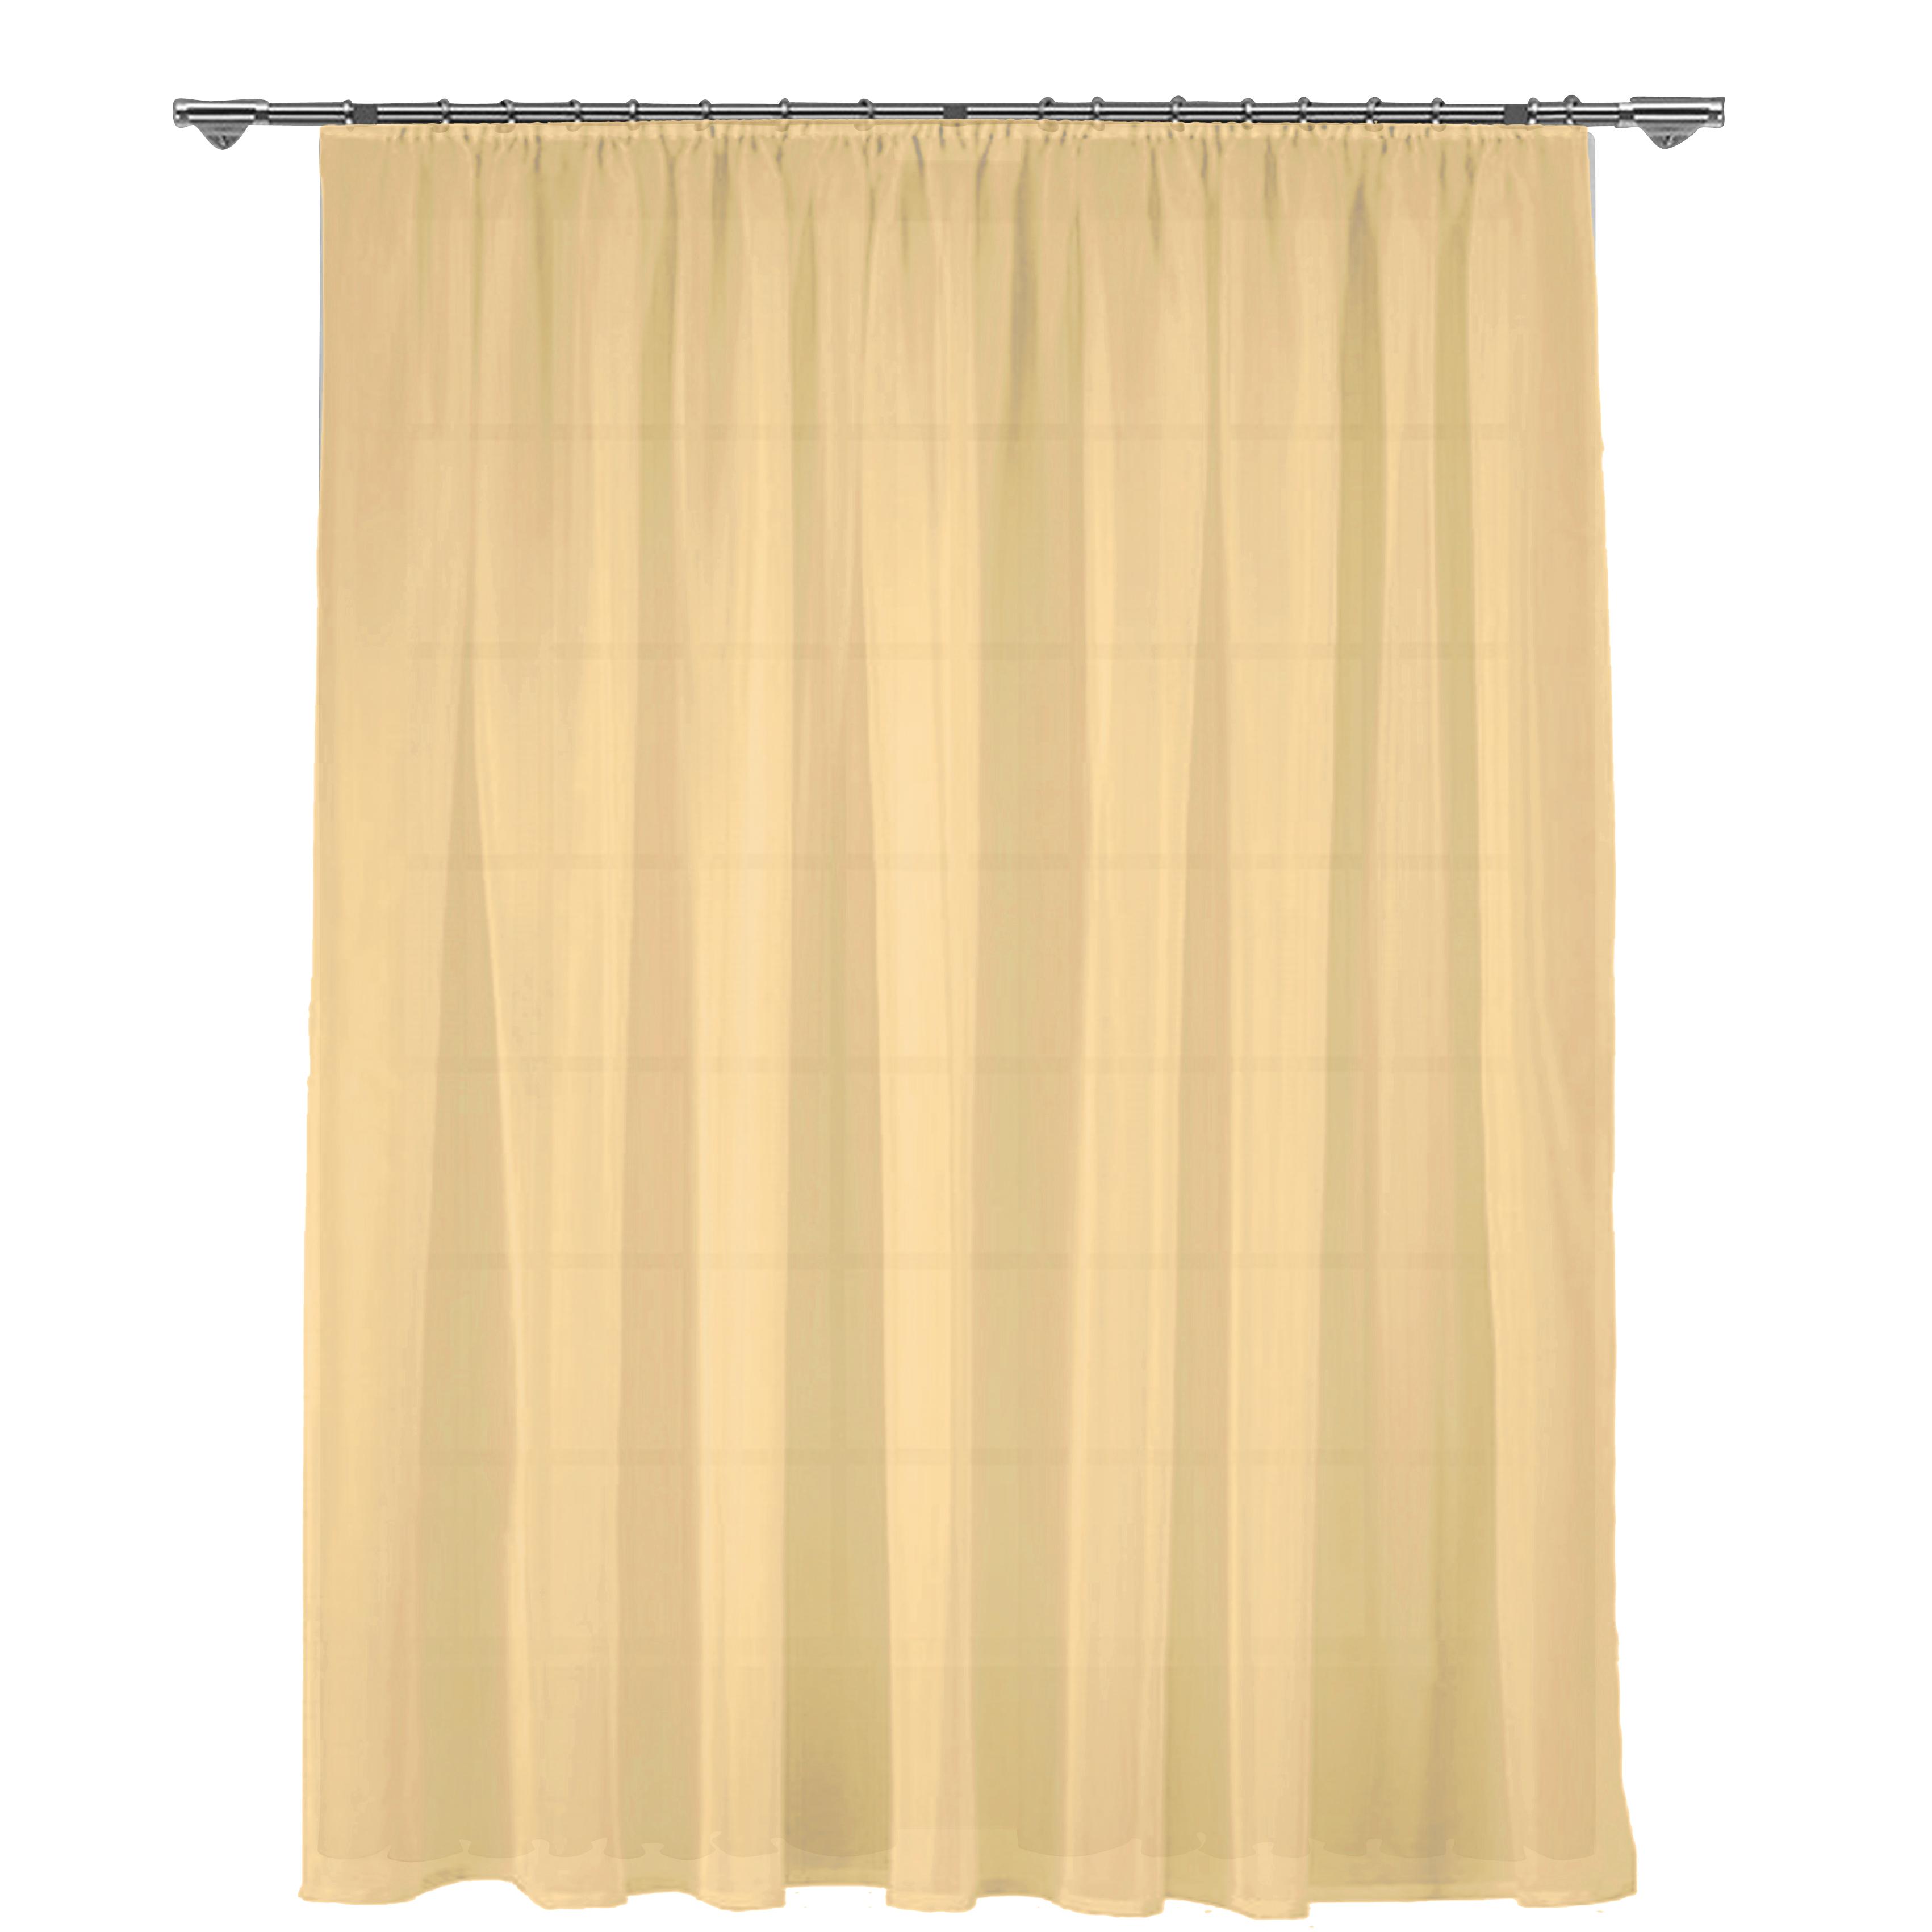 Шторы Amore Mio Классические шторы Shyann Цвет: Персиковый шторы tac классические шторы winx цвет персиковый 200x265 см